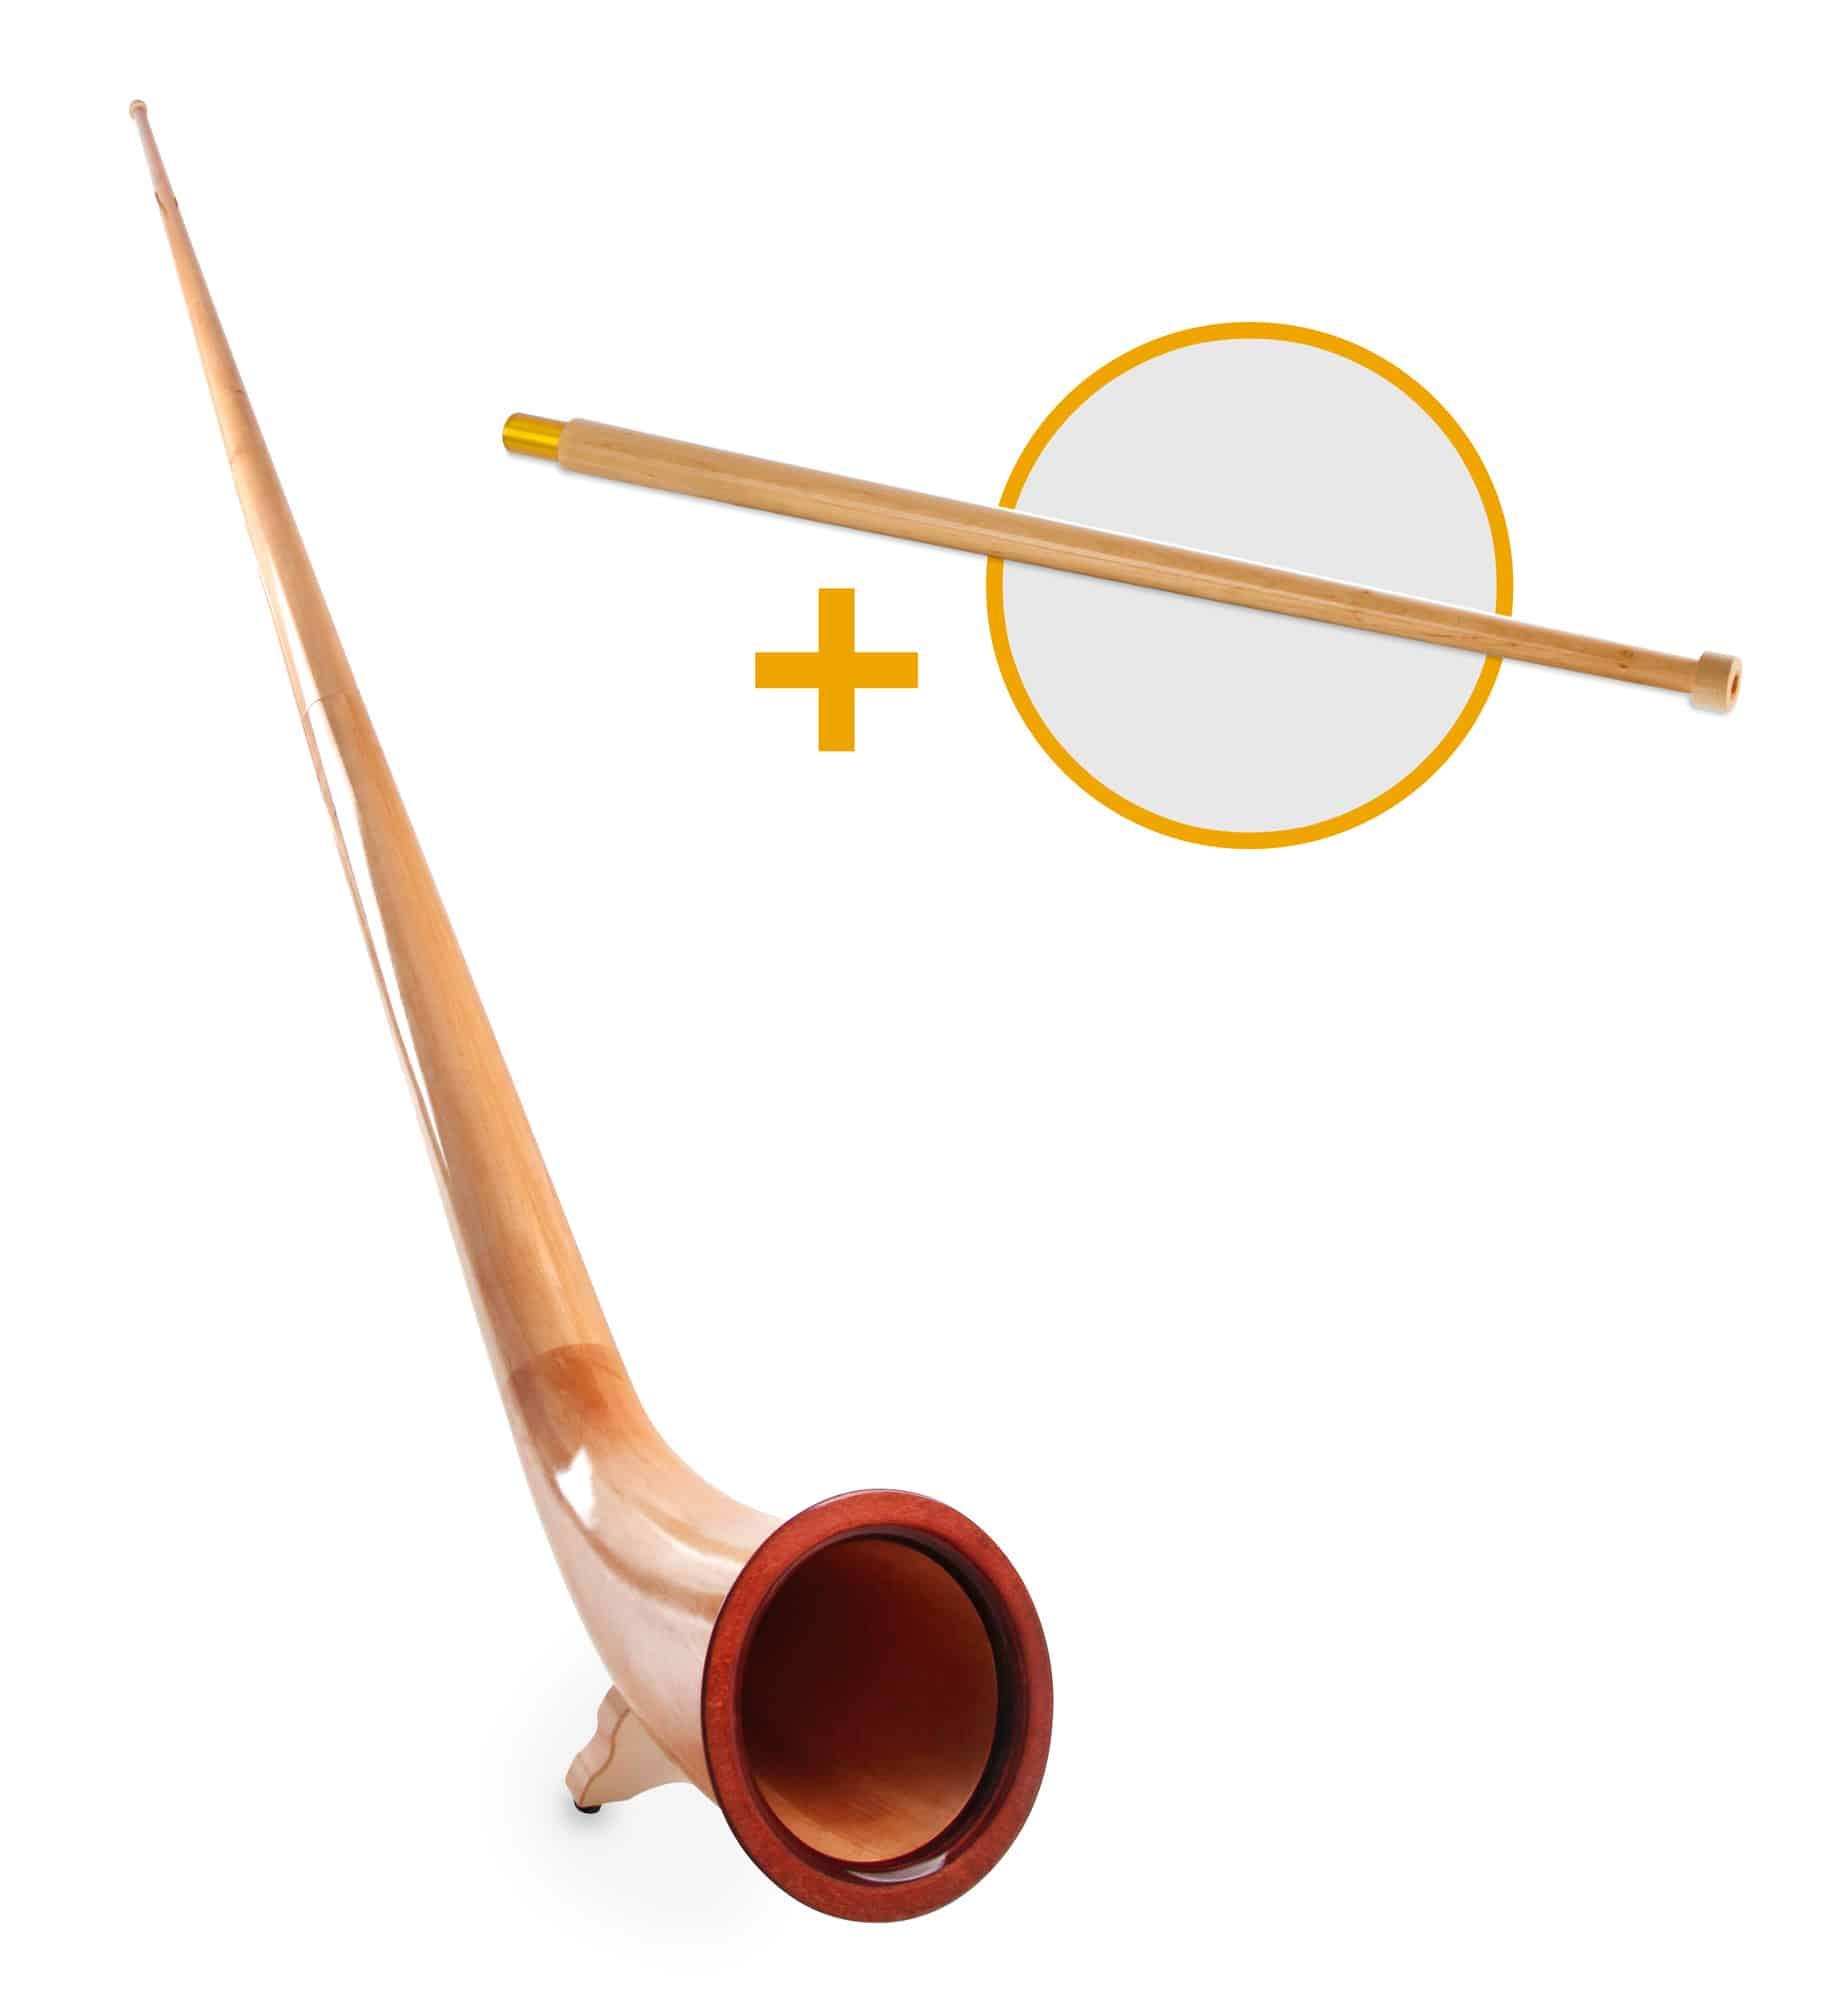 Hoerner - Lechgold Alphorn Erle F 360 cm 3 teilig Set inkl. Fis Handrohr - Onlineshop Musikhaus Kirstein